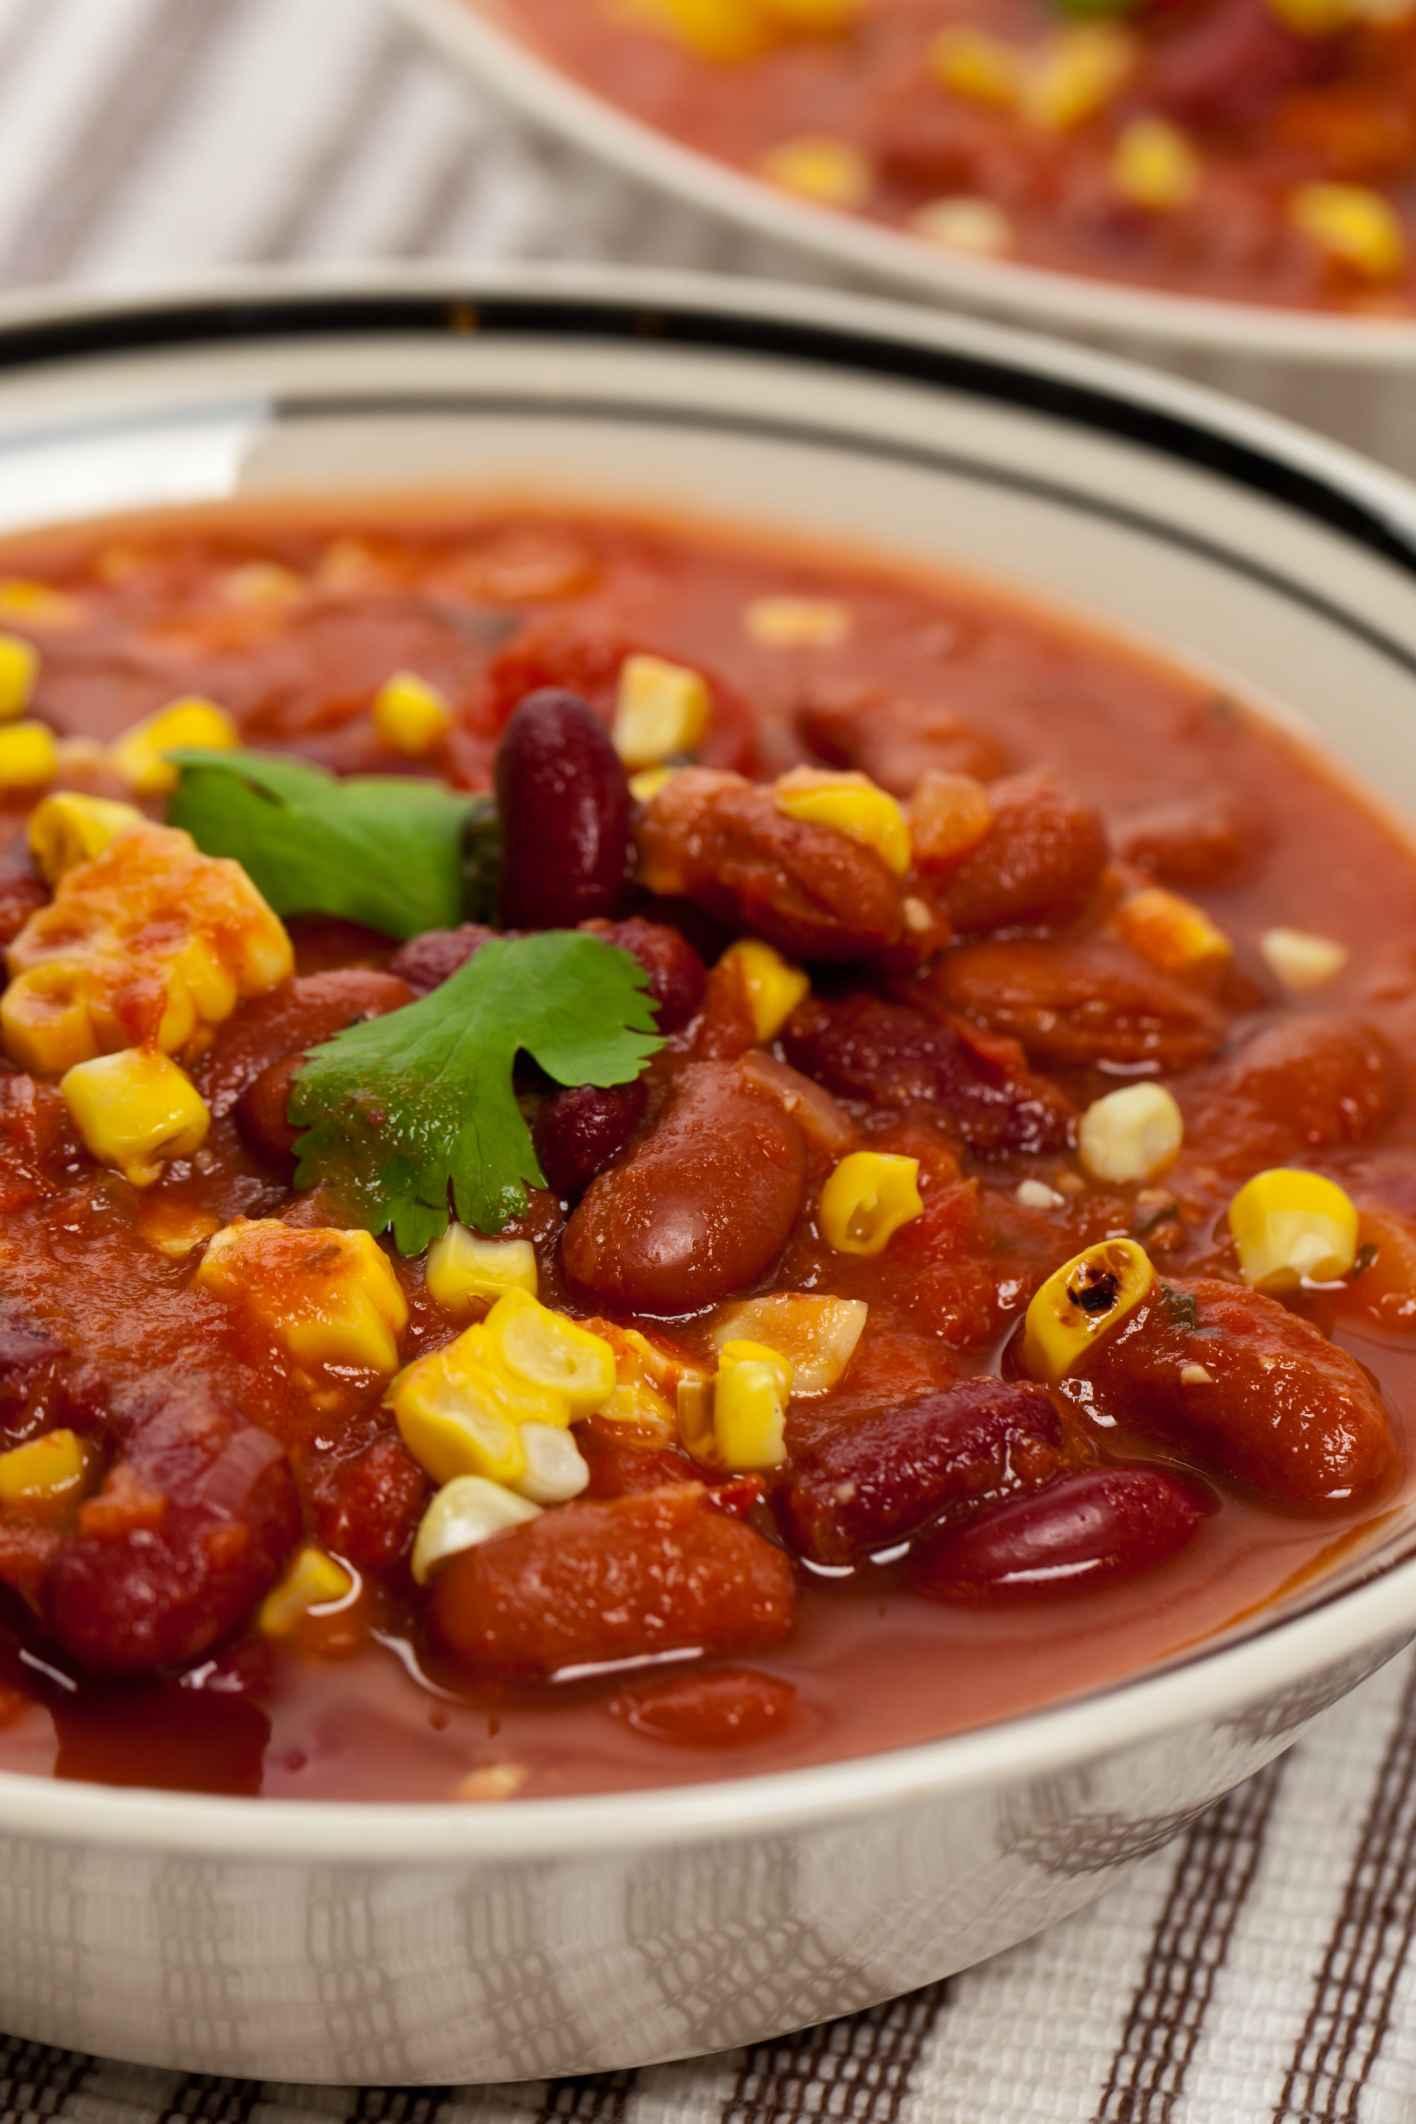 Knorr Vegetable Soup Mix